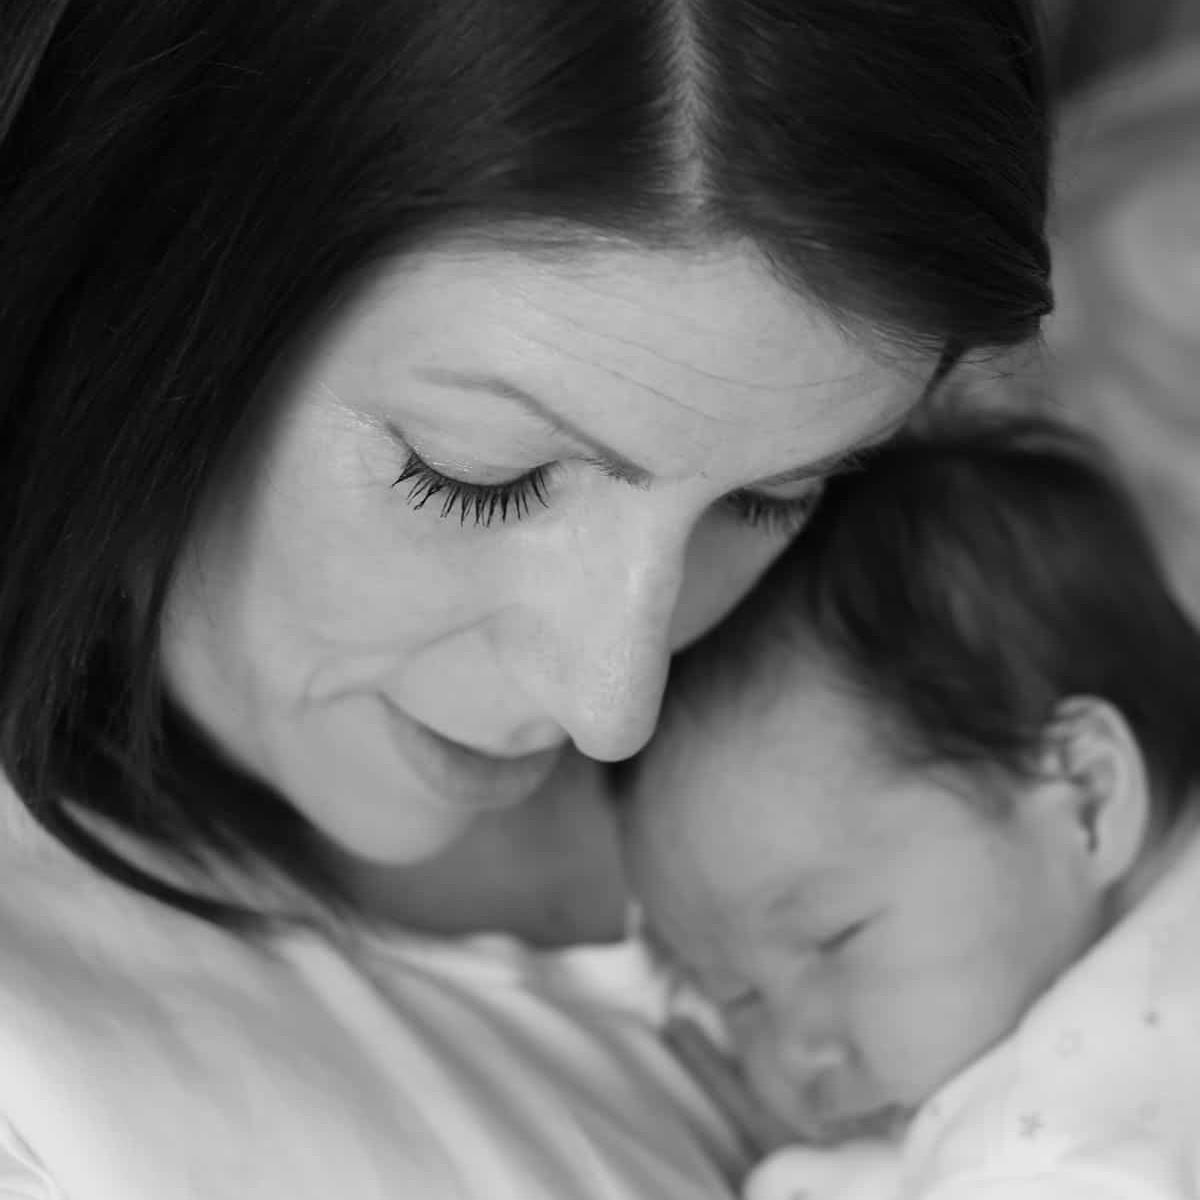 Newborn Photoshoots at home. Edinburgh and surrounding areas. 19